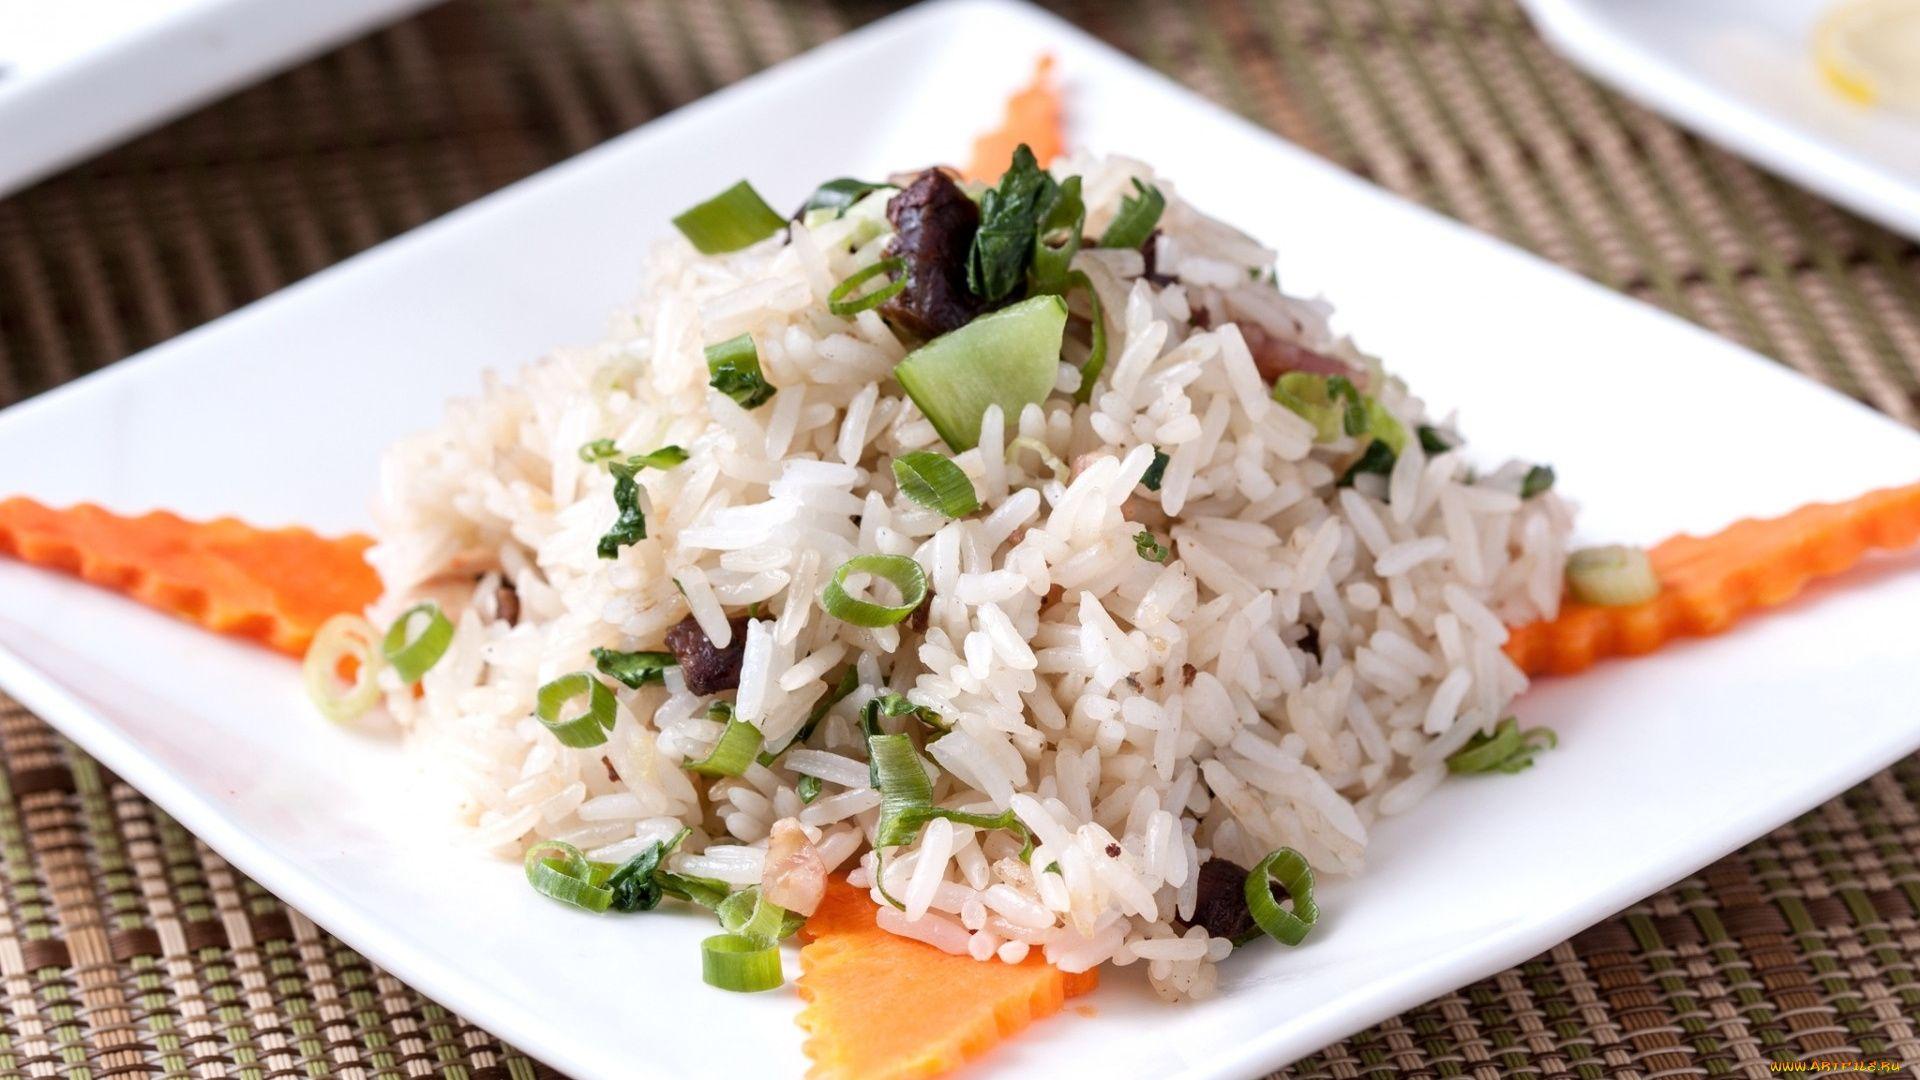 Rice wallpaper for laptop